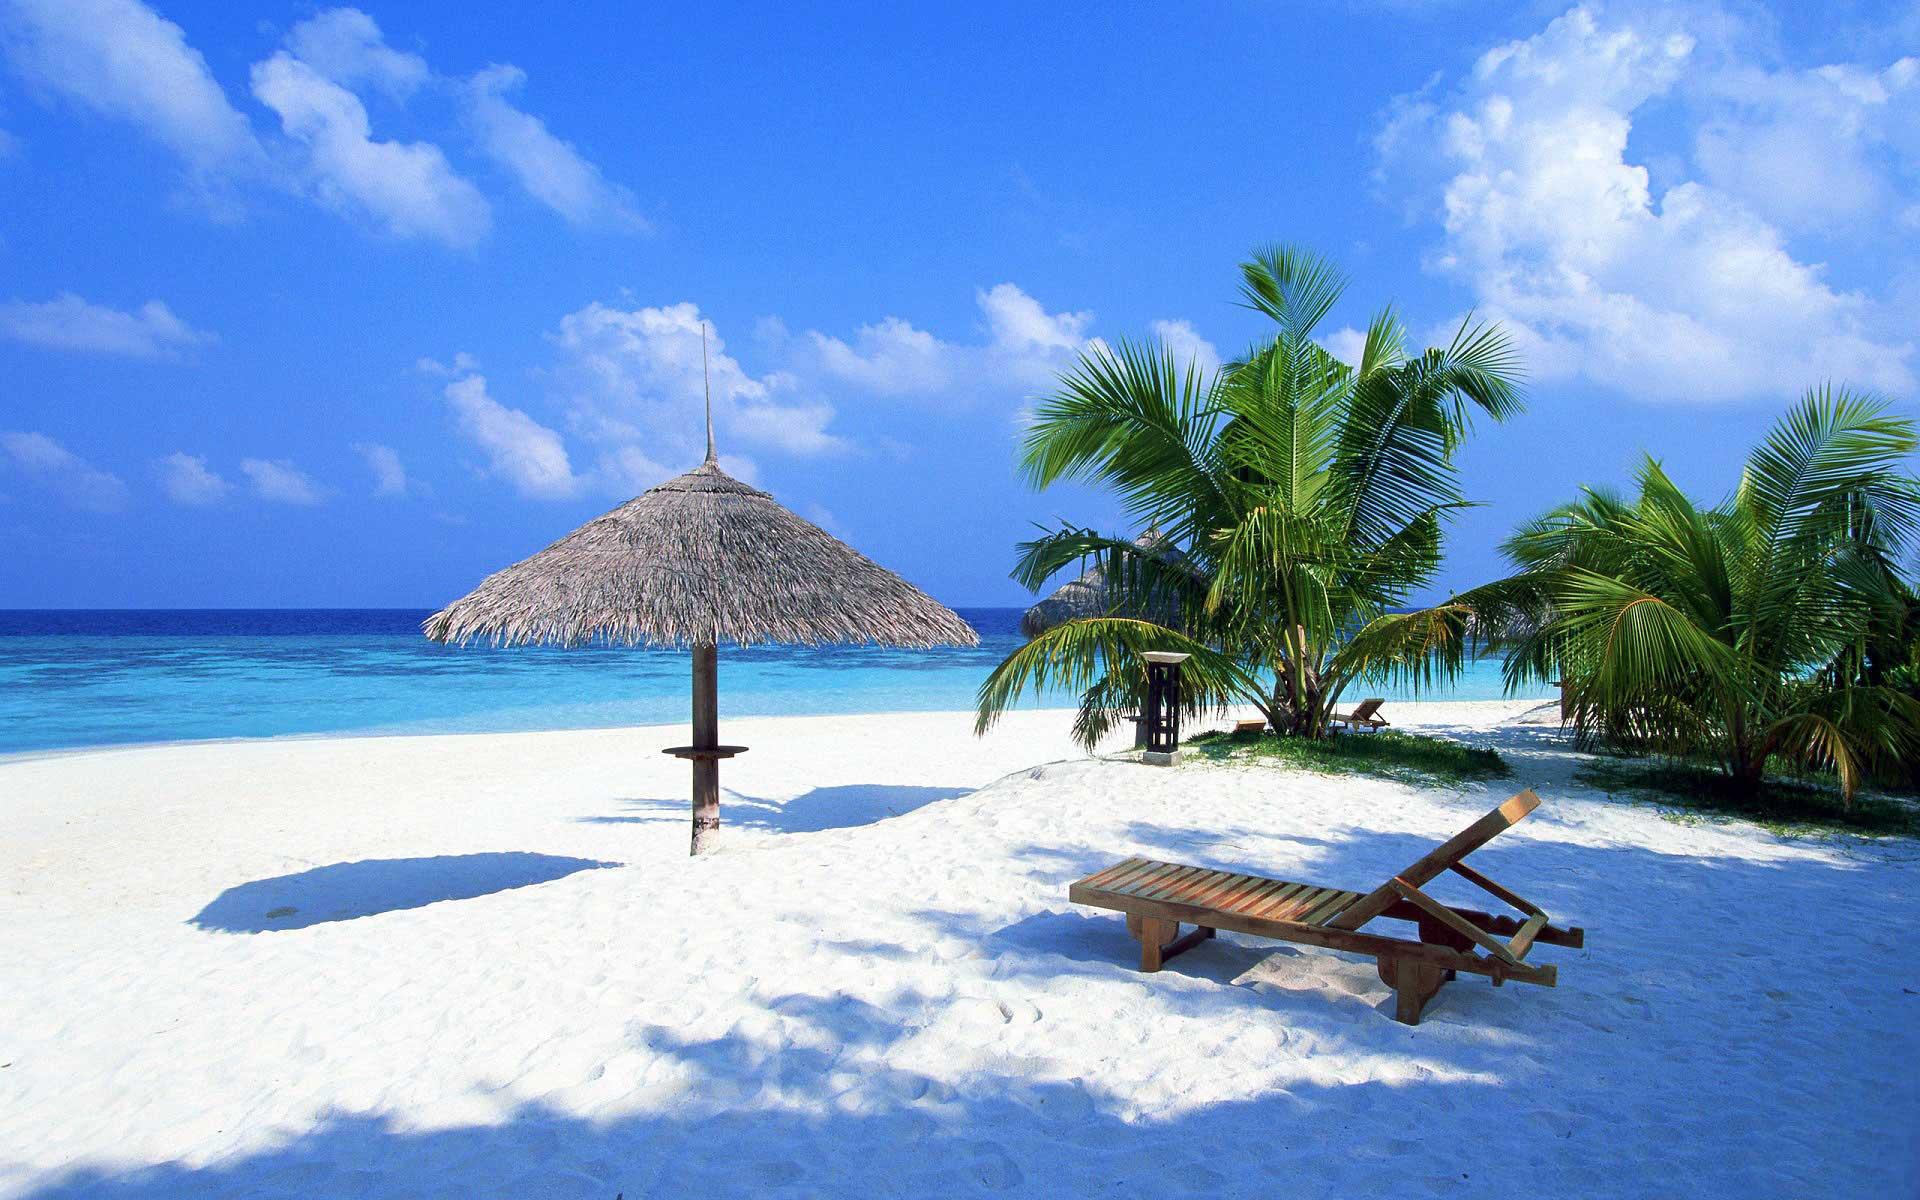 spanskakurs-mexico-playa-del-carmen